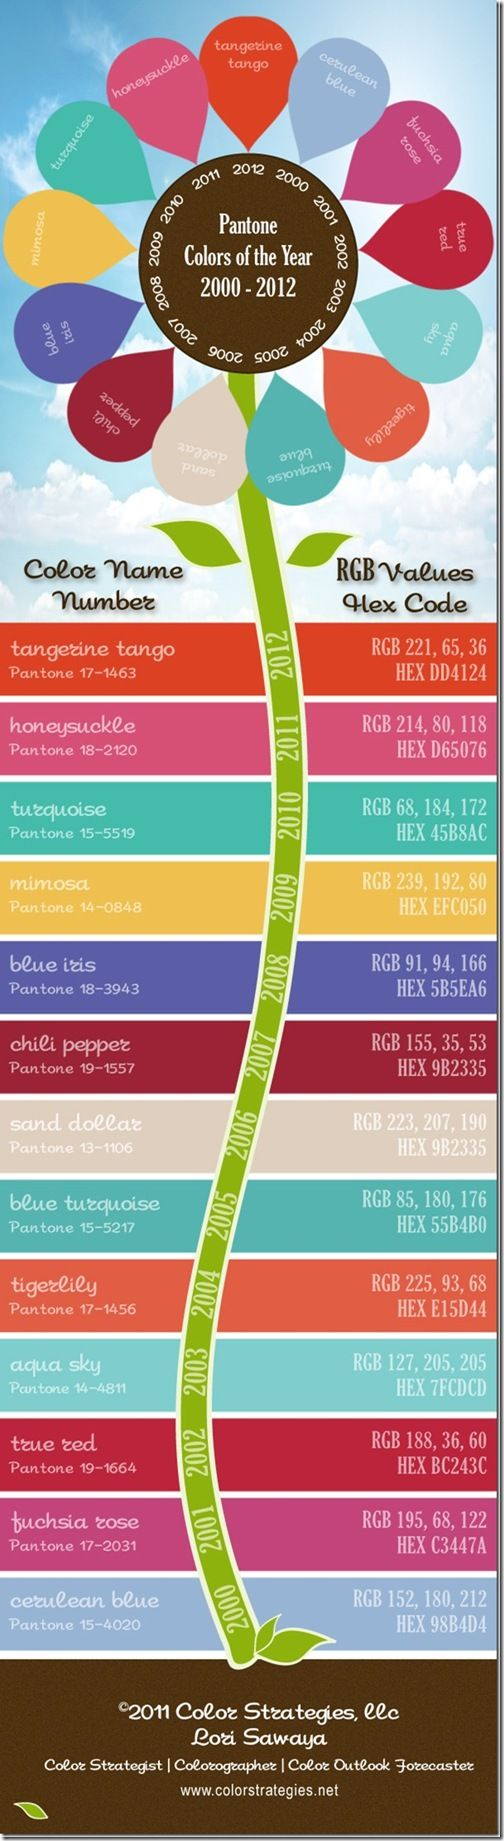 Pantone Color-of-the-Year | Pantone color, Pantone and Rgb code